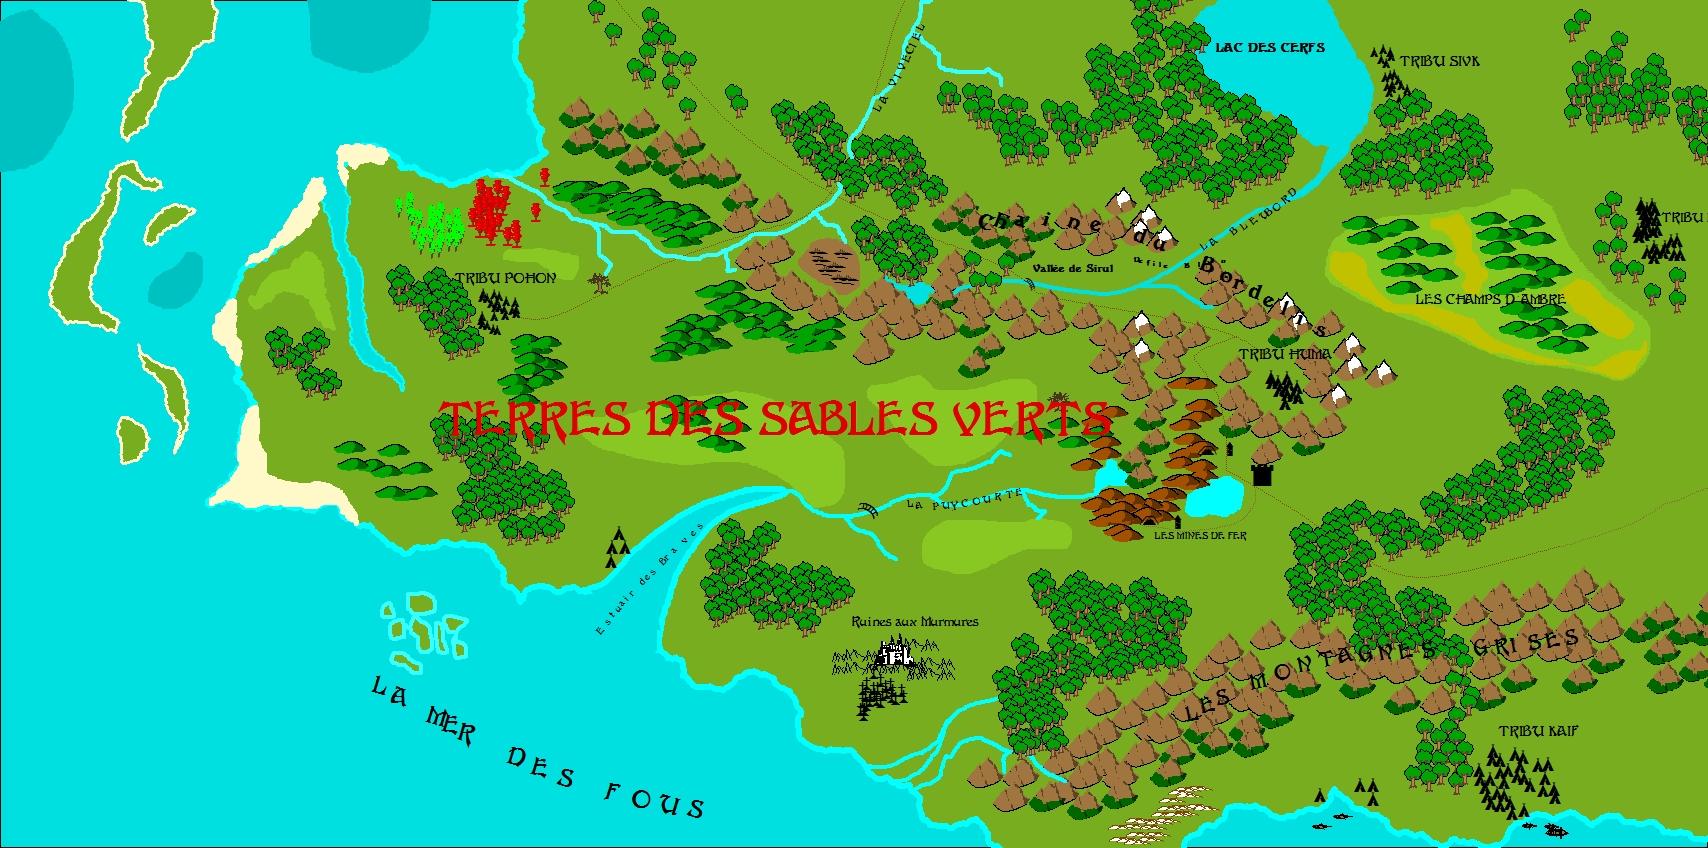 Les Terres des Sables Verts